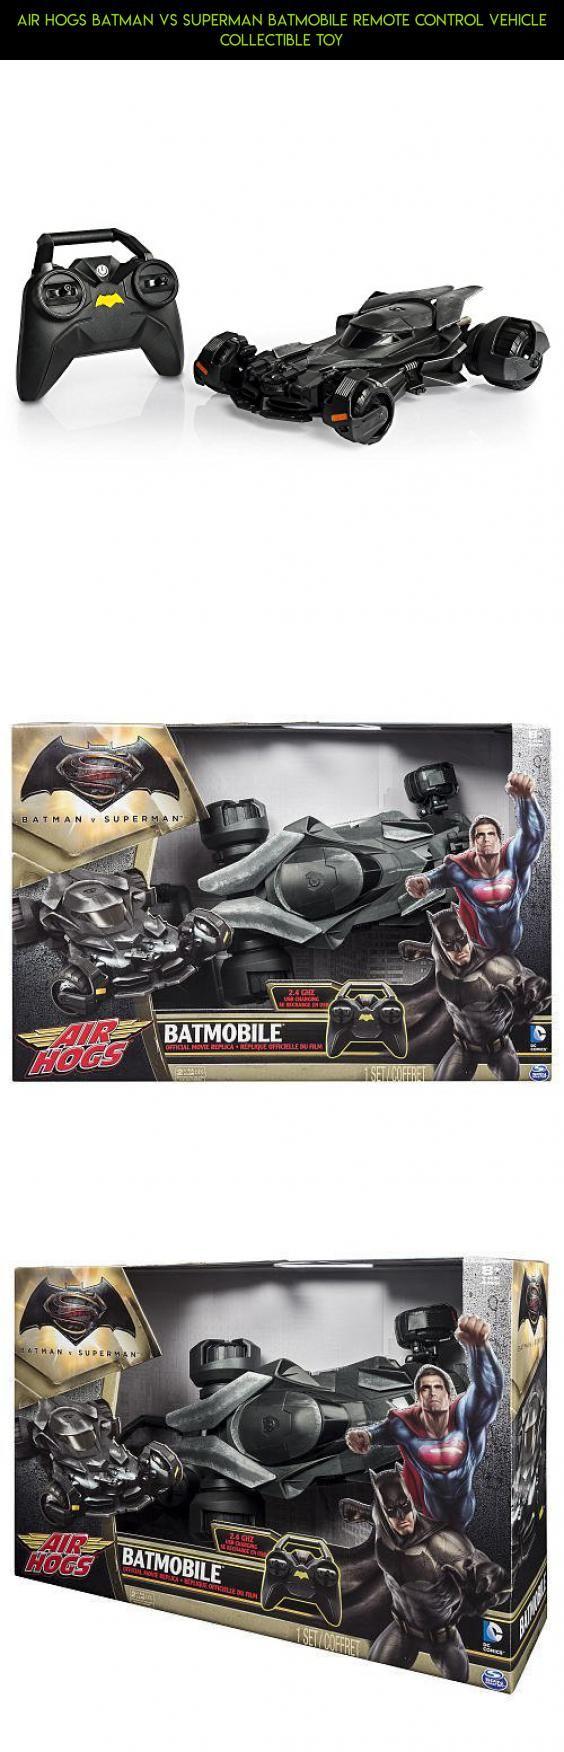 Air Hogs Batman Vs Superman Batmobile Remote Control Vehicle Collectible Toy #drone #racing #batmobile #air #parts #tech #shopping #kit #technology #hogs #camera #products #batman #gadgets #vs. #superman #plans #fpv